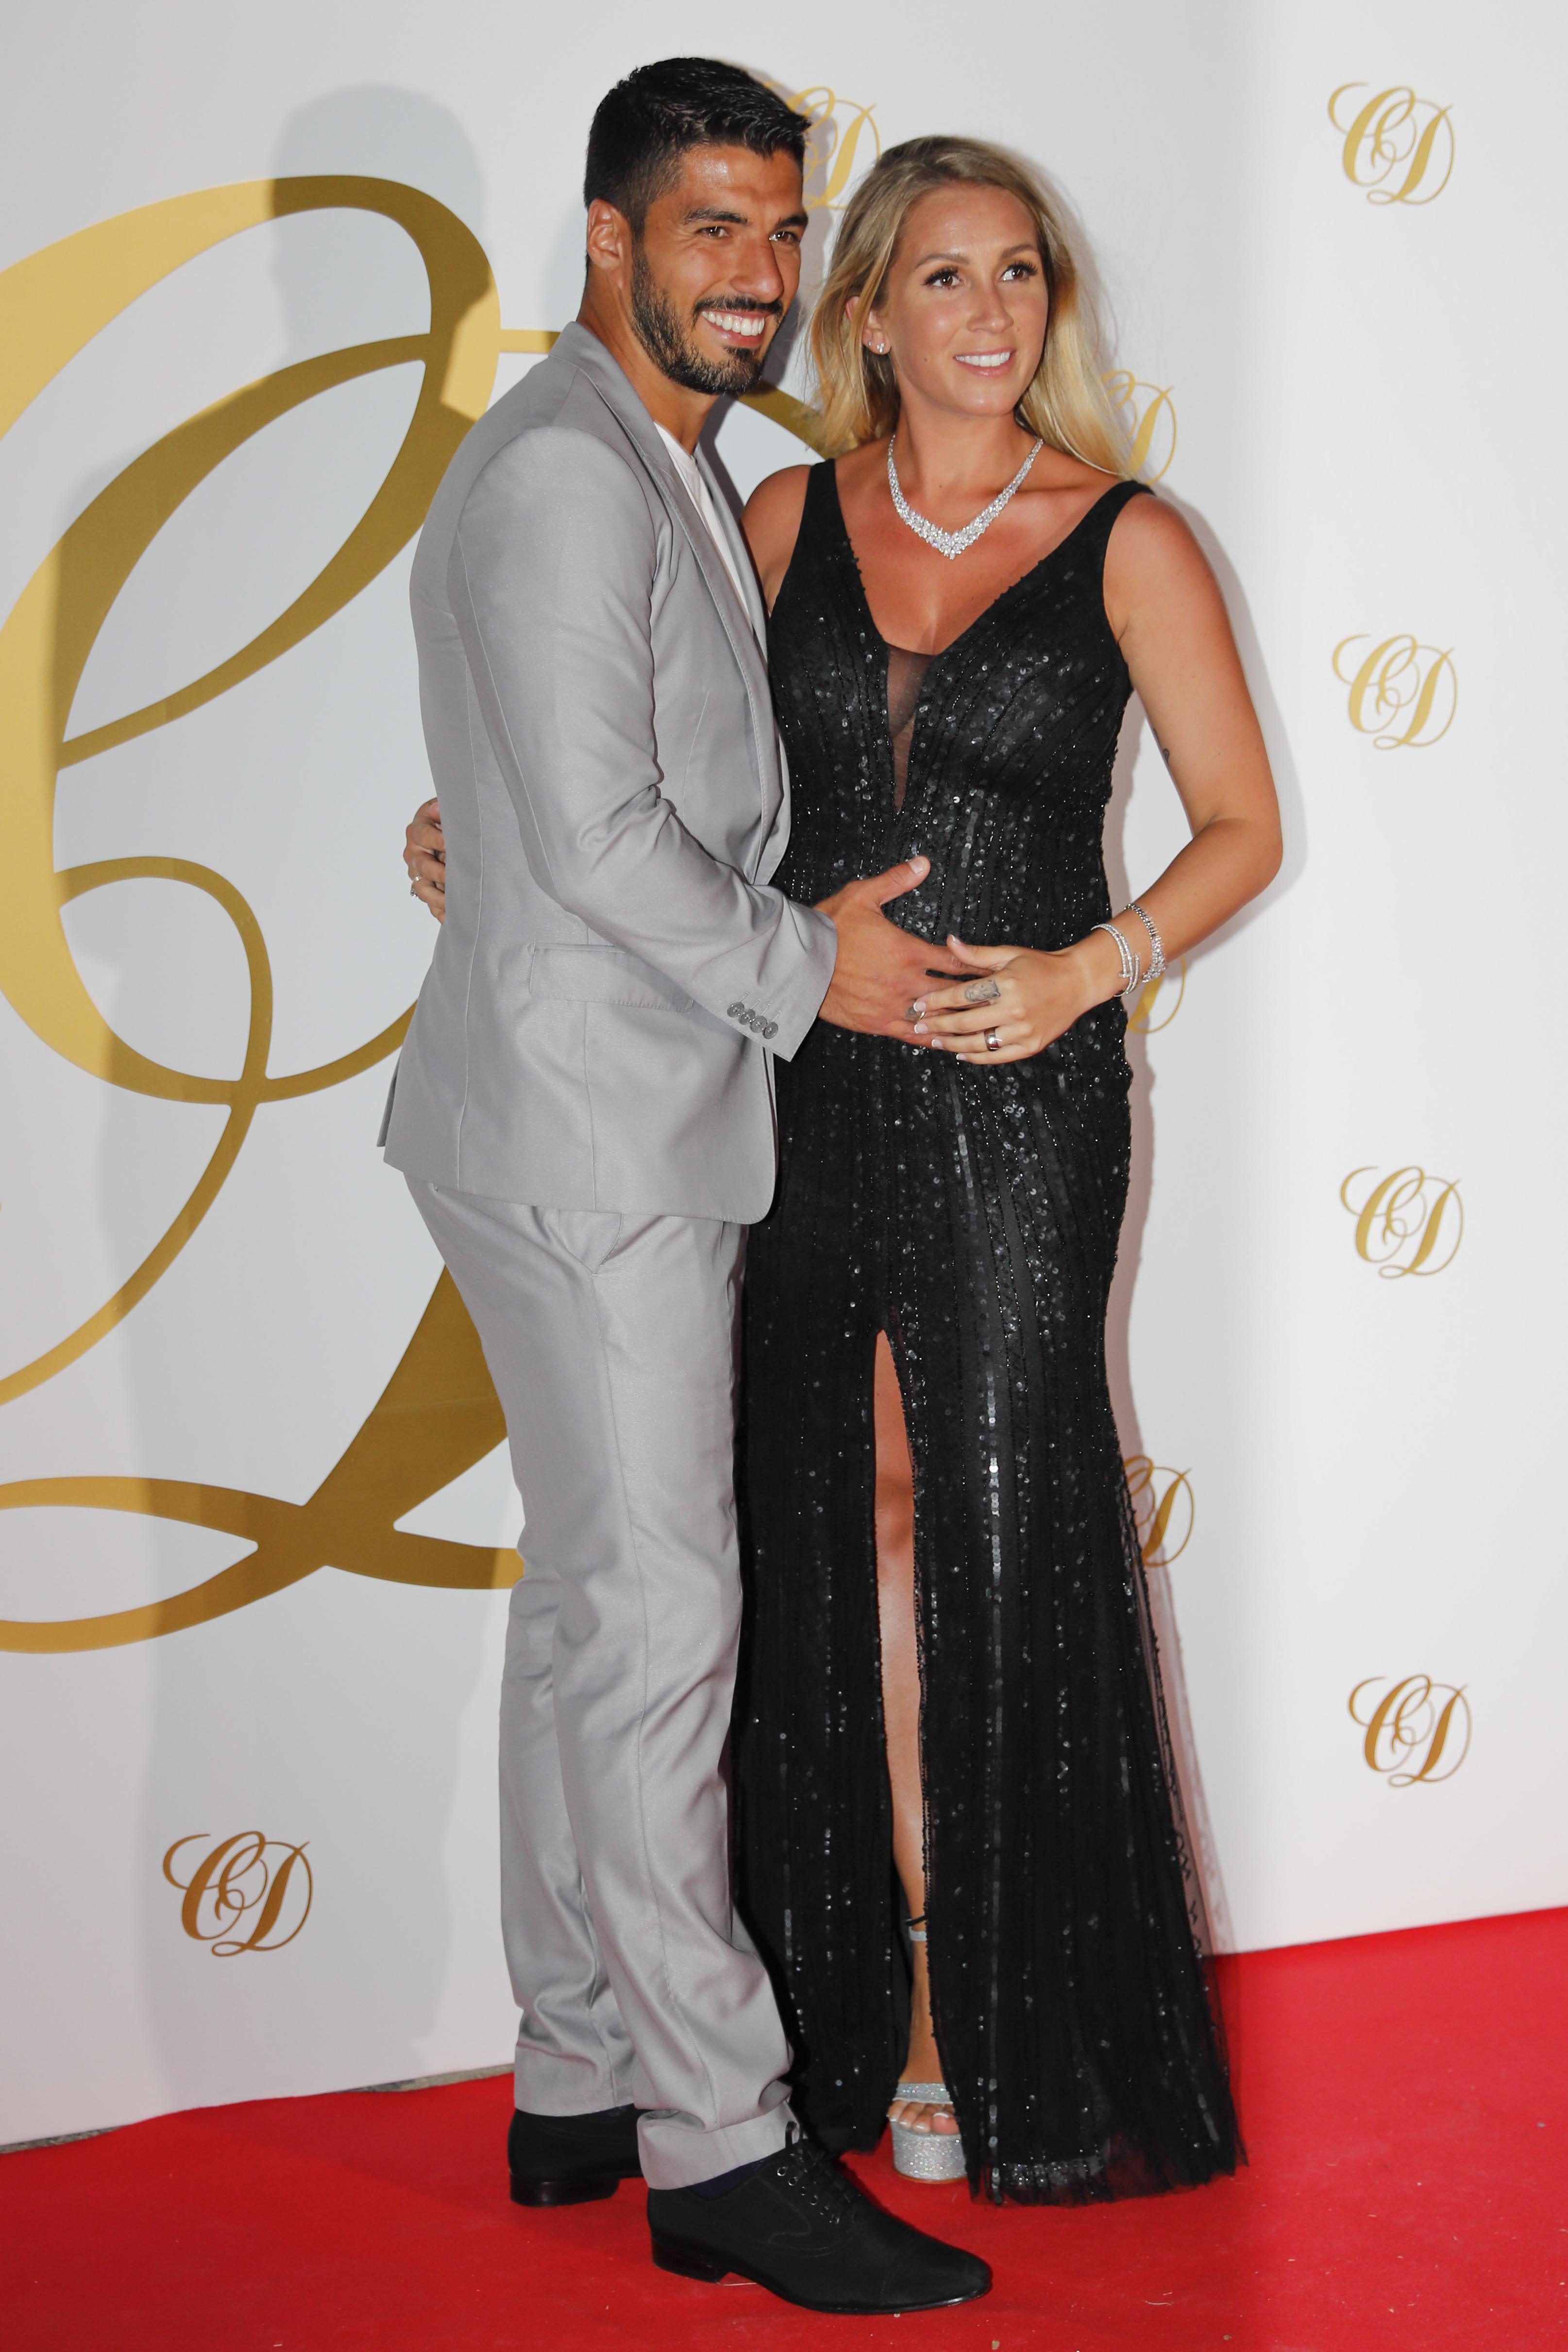 Luis Suarez and wife Sofia Balbi are close friends with Cesc Fabregas and Daniella Semaan